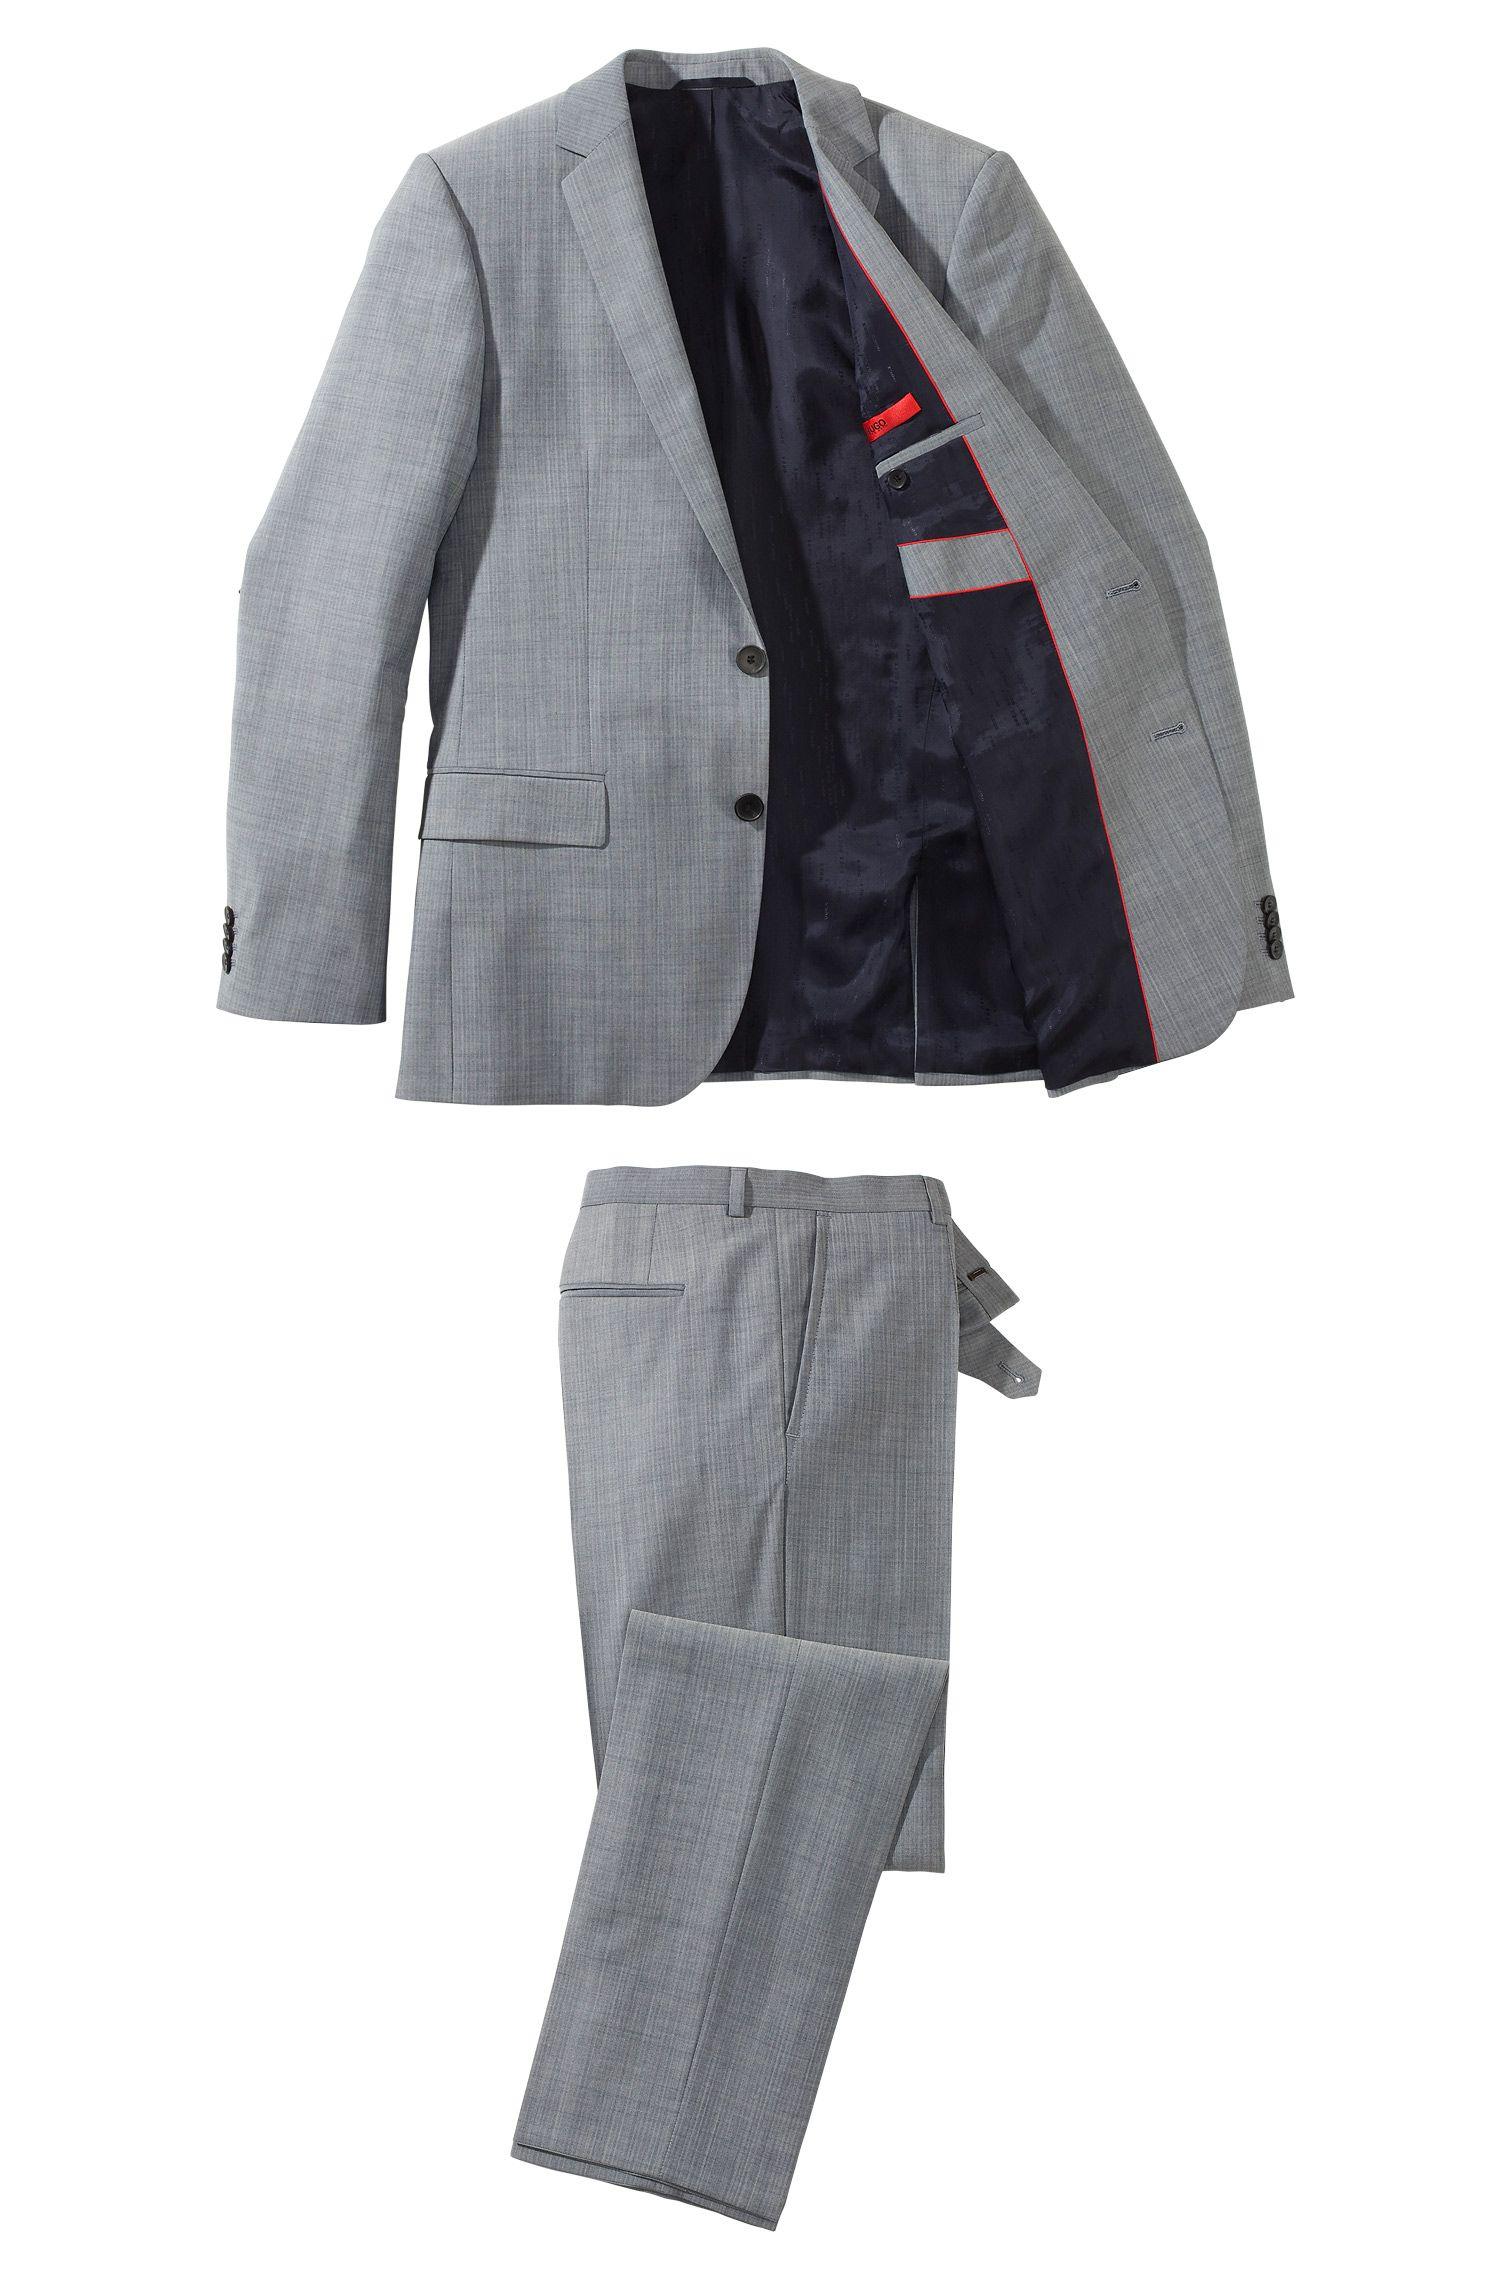 Costume de coupe Modern Slim Fit, Amaro/Heise